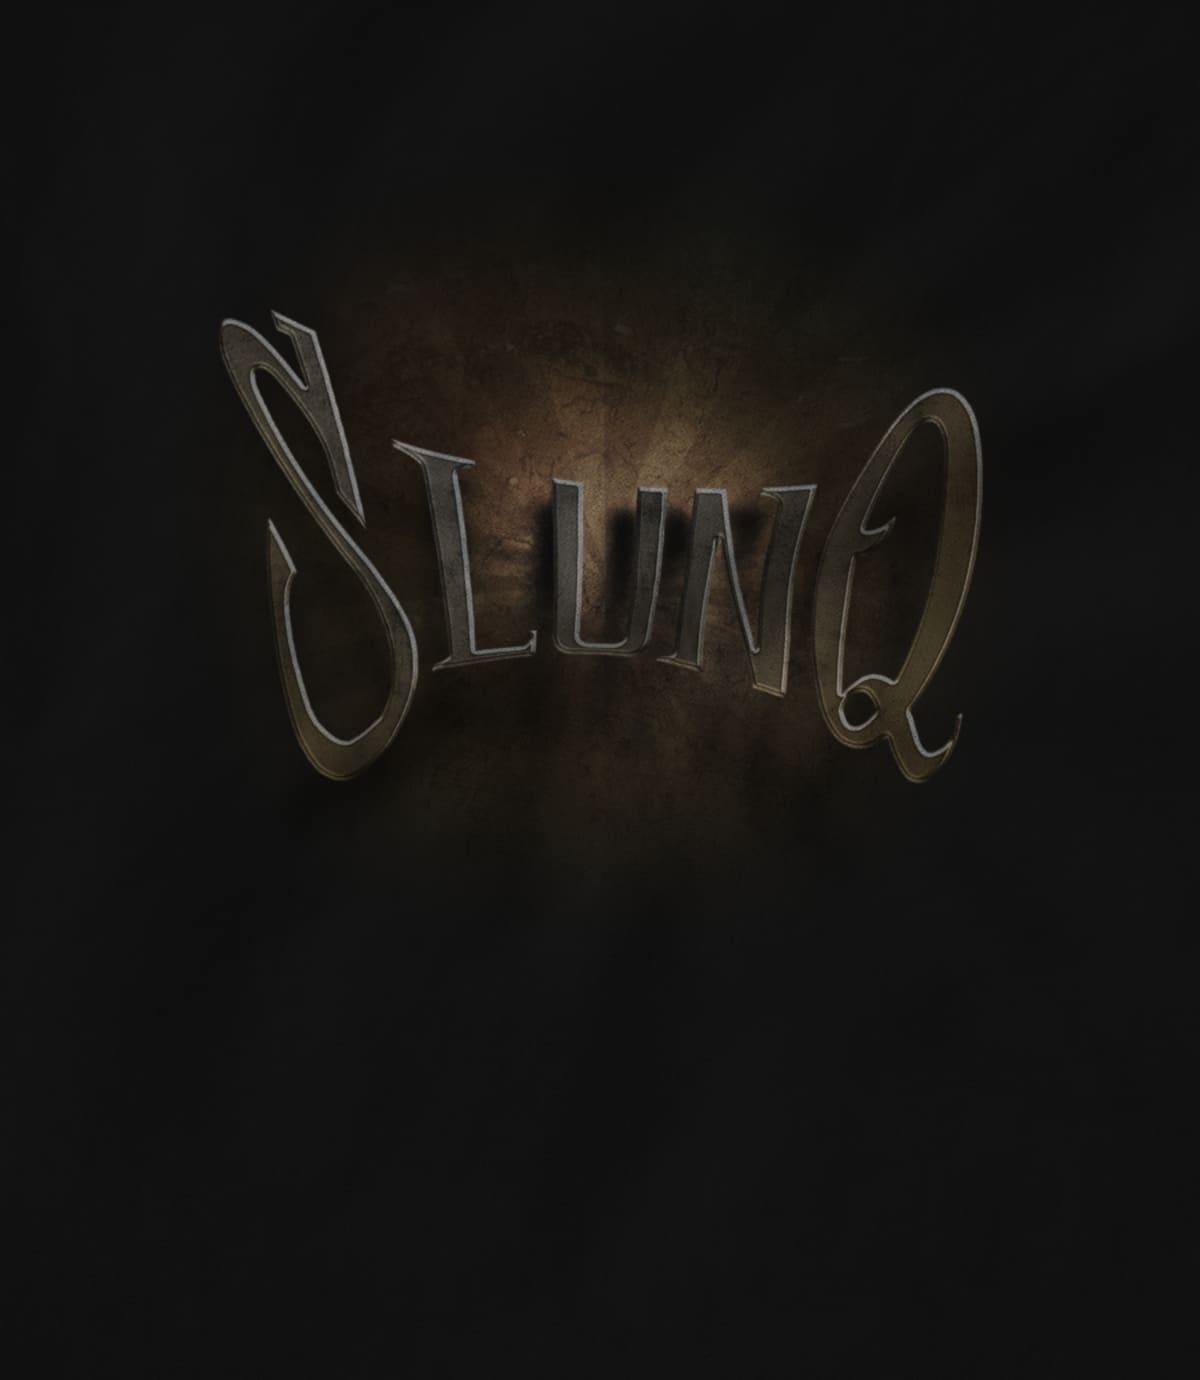 Slunq